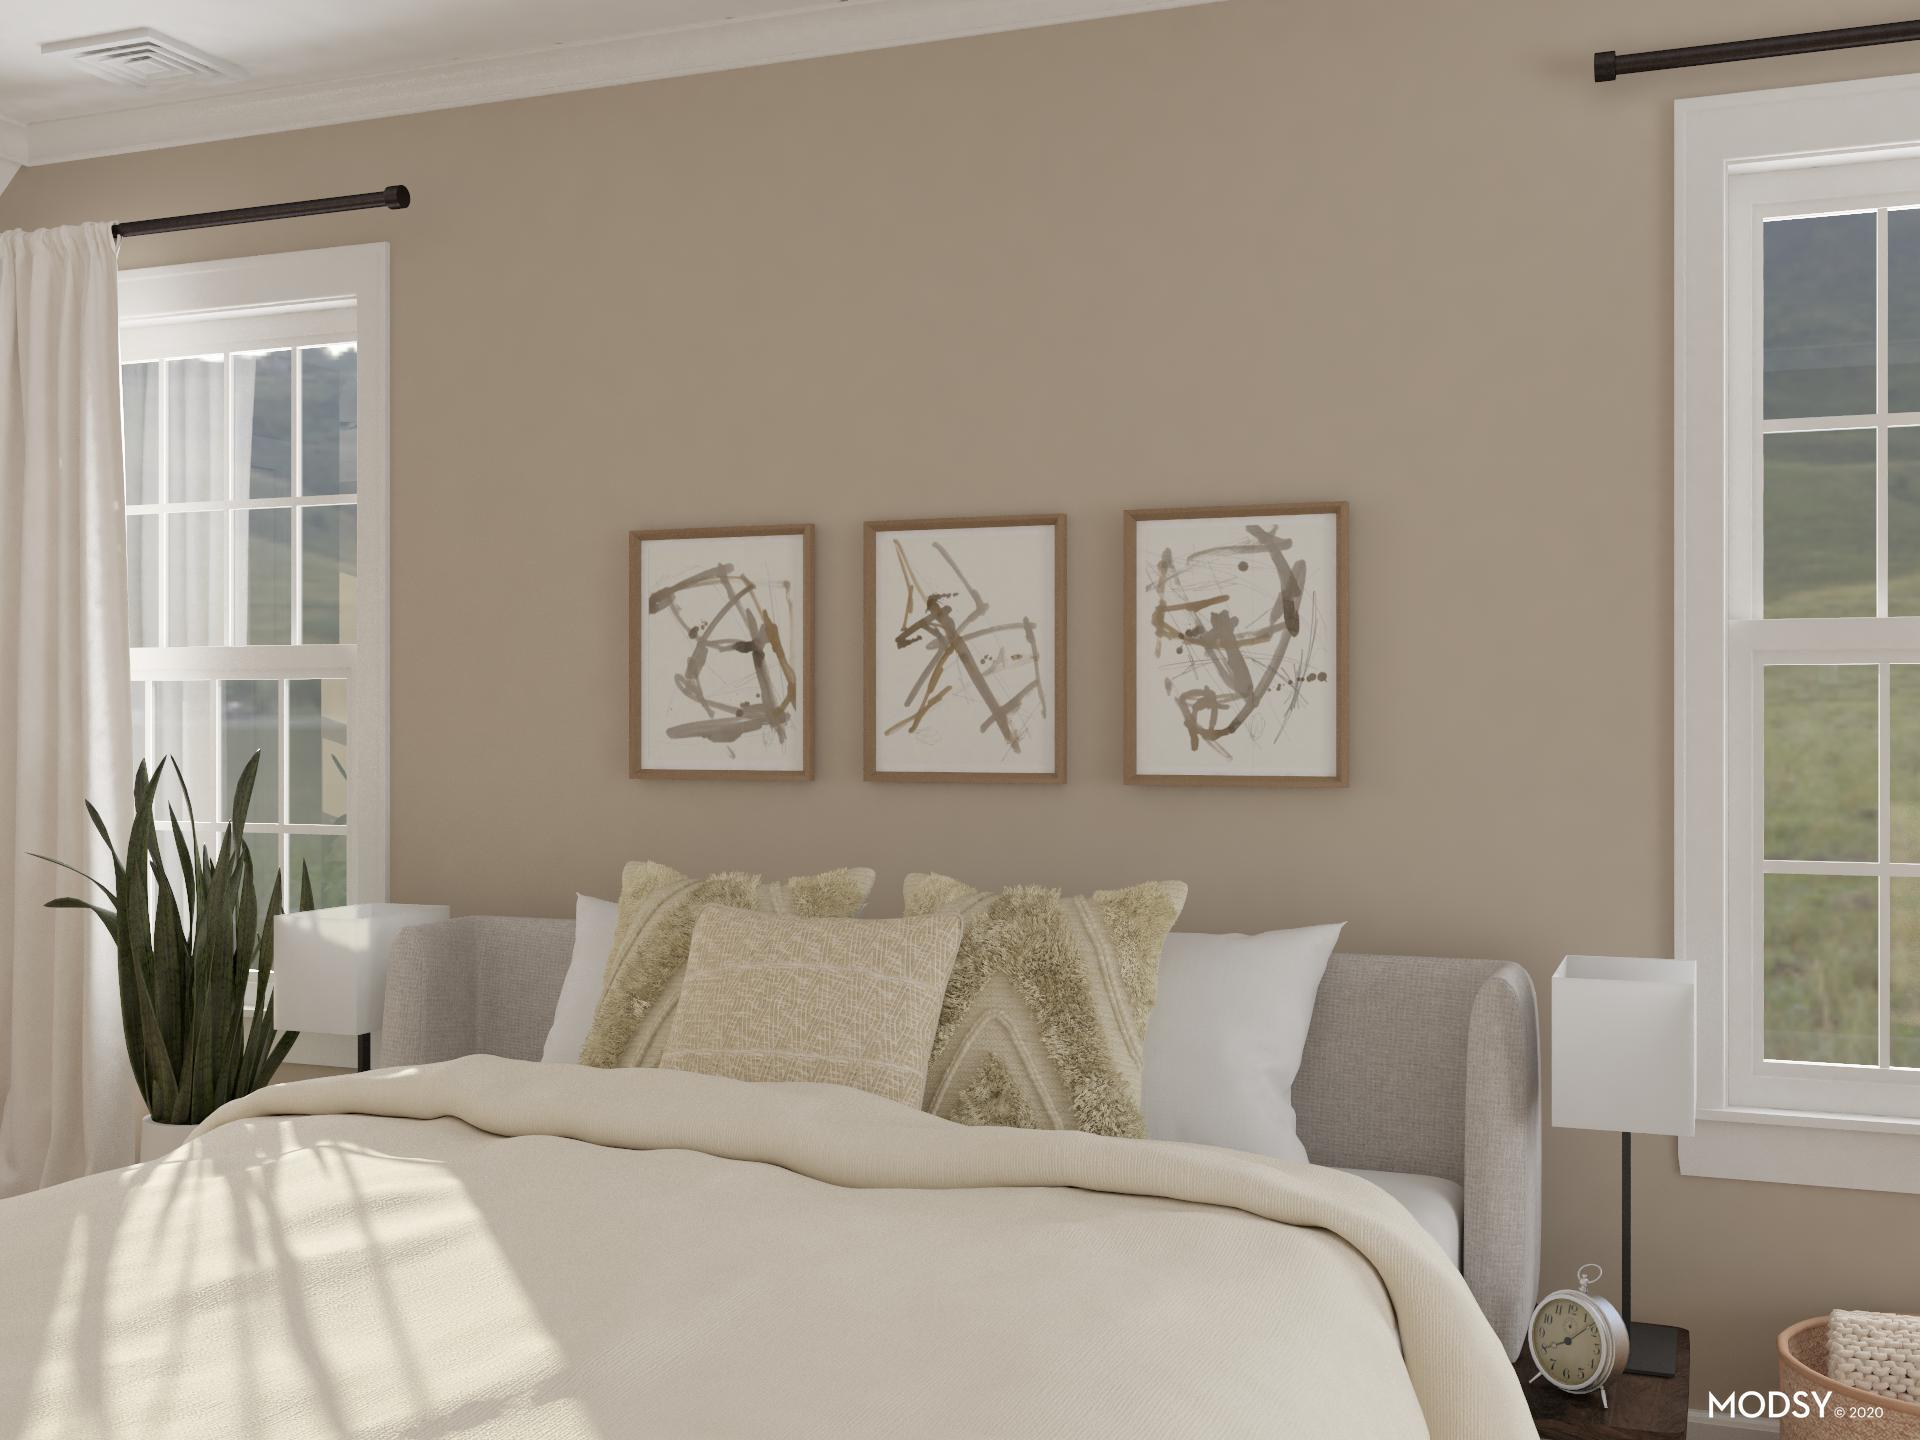 Restful Neutral Bedroom | Minimalist-Style Bedroom Design ... on Neutral Minimalist Bedroom Ideas  id=38034